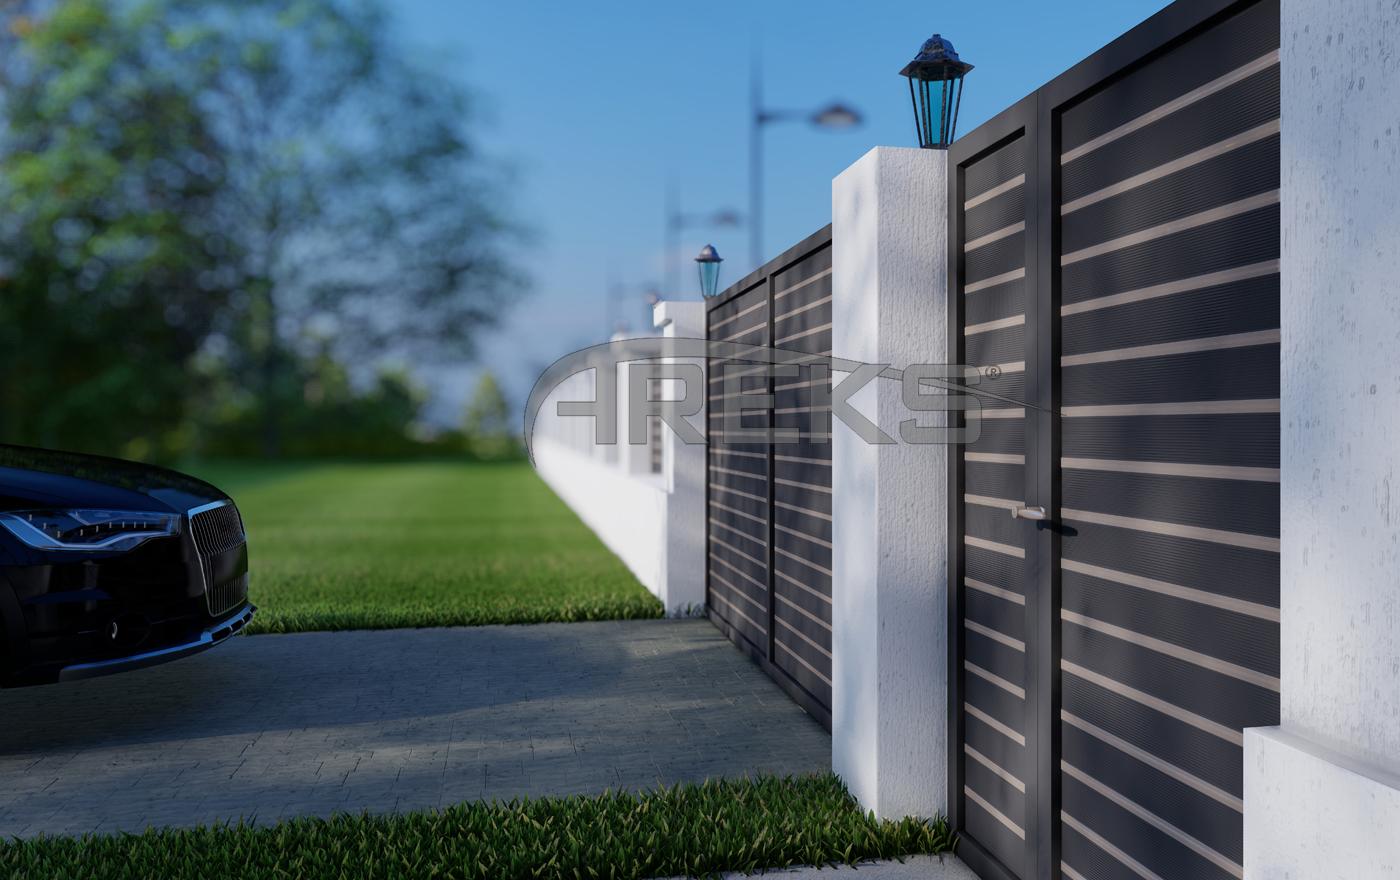 ALUMİNYUM BAHÇE ÇİT UYGULAMA aluminium railing Aluminium glass railing Aluminium fence